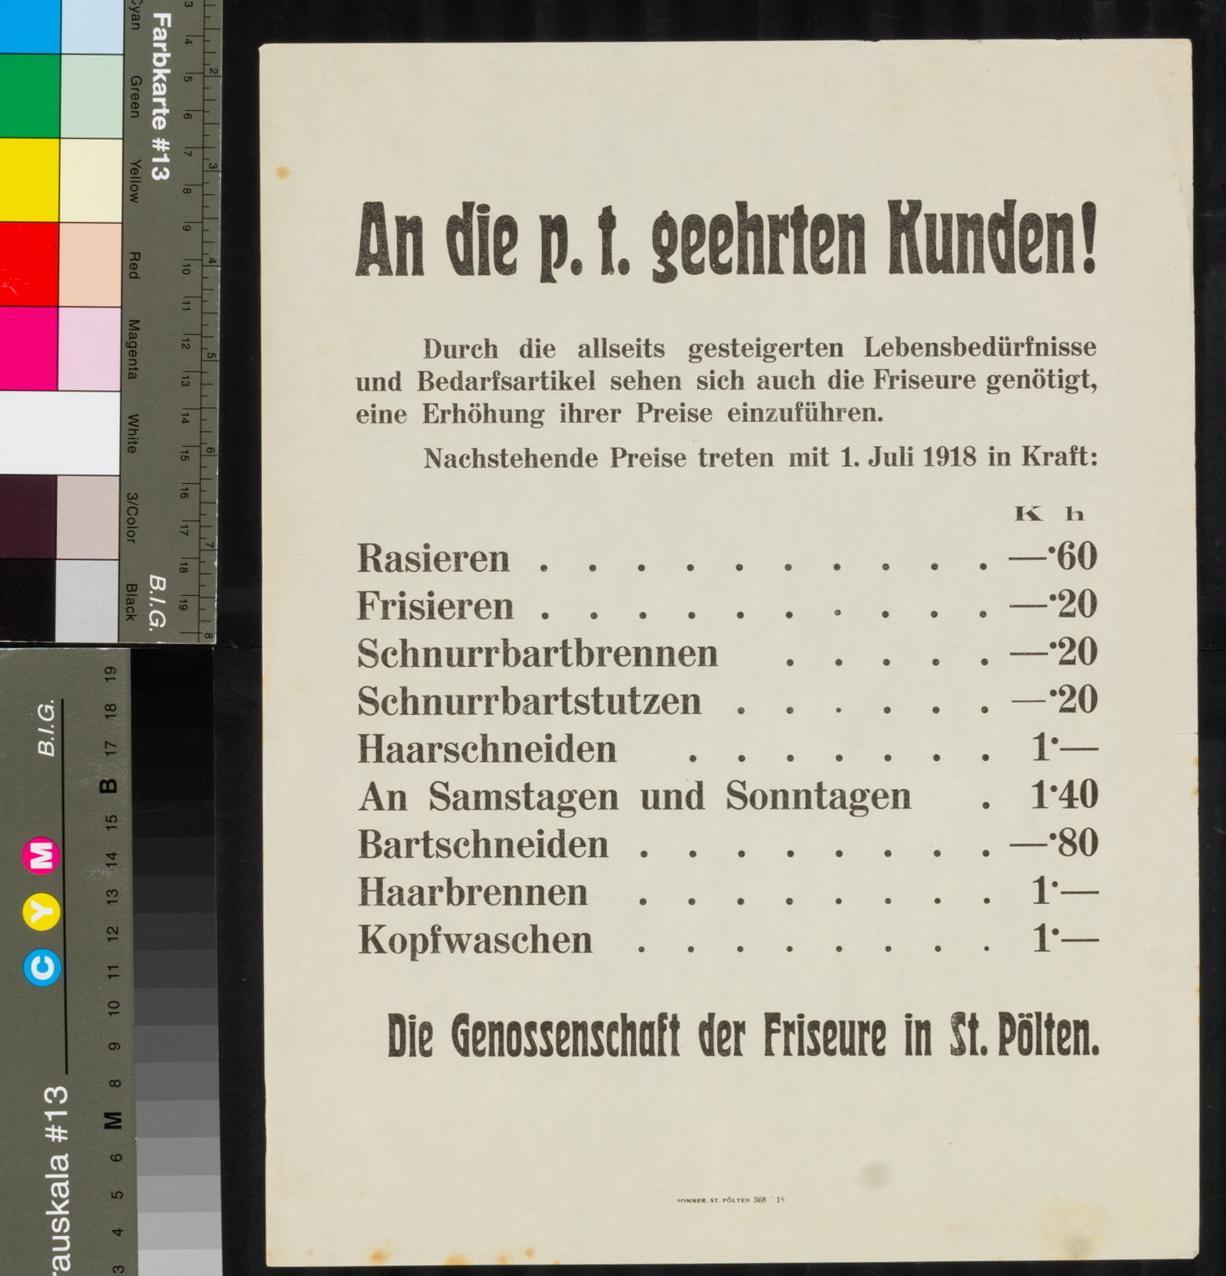 Kundmachung, Preiserhöhung der Genossenschaft der Friseure, 1. Juli 1918, St. Pölten